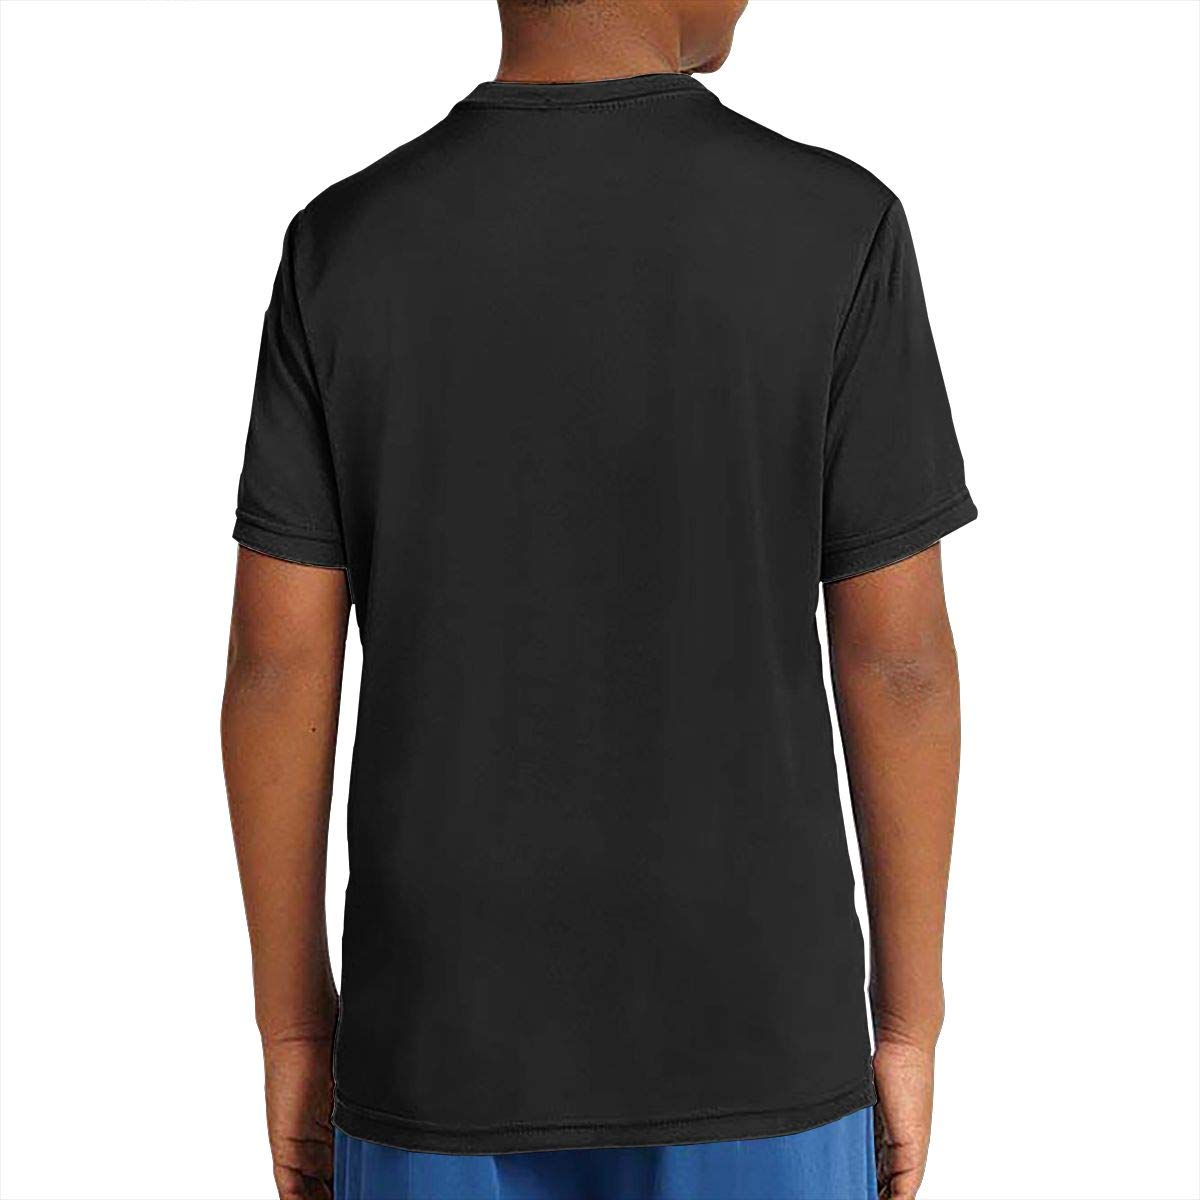 Slightly Stoopid Boys Girls Interesting Graphic T Shirt Kids Teenagers Short Sleeve Tops